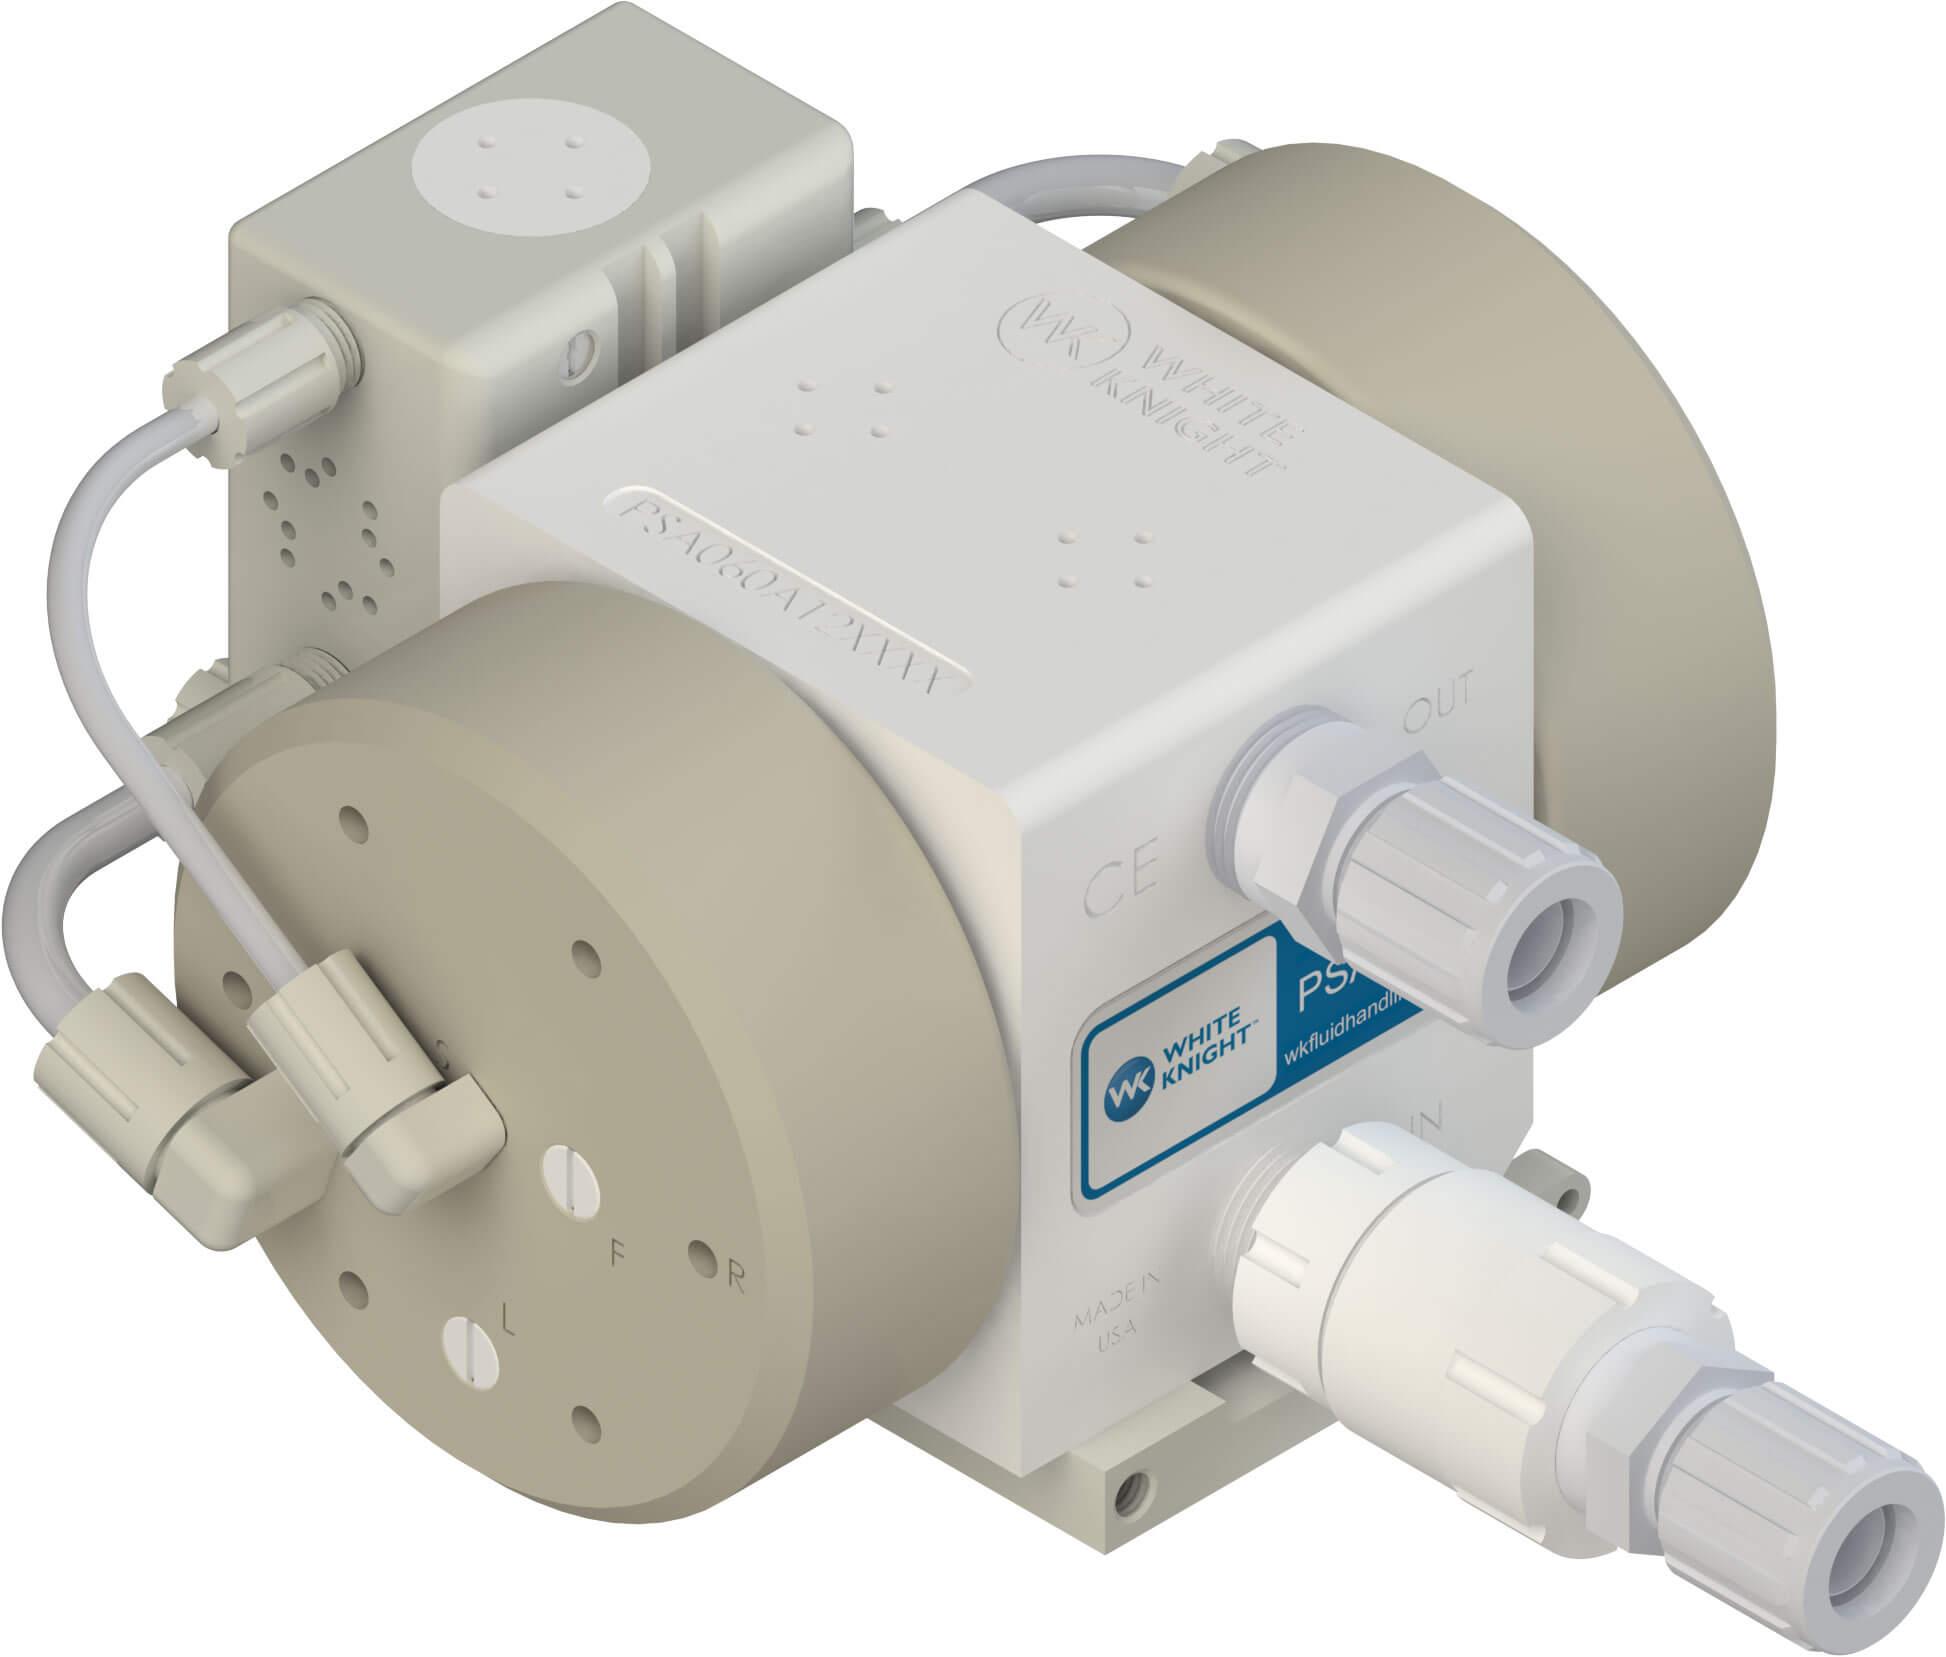 PSA060 Pump with FD12-P-BX00 Pre-Filter Catcher